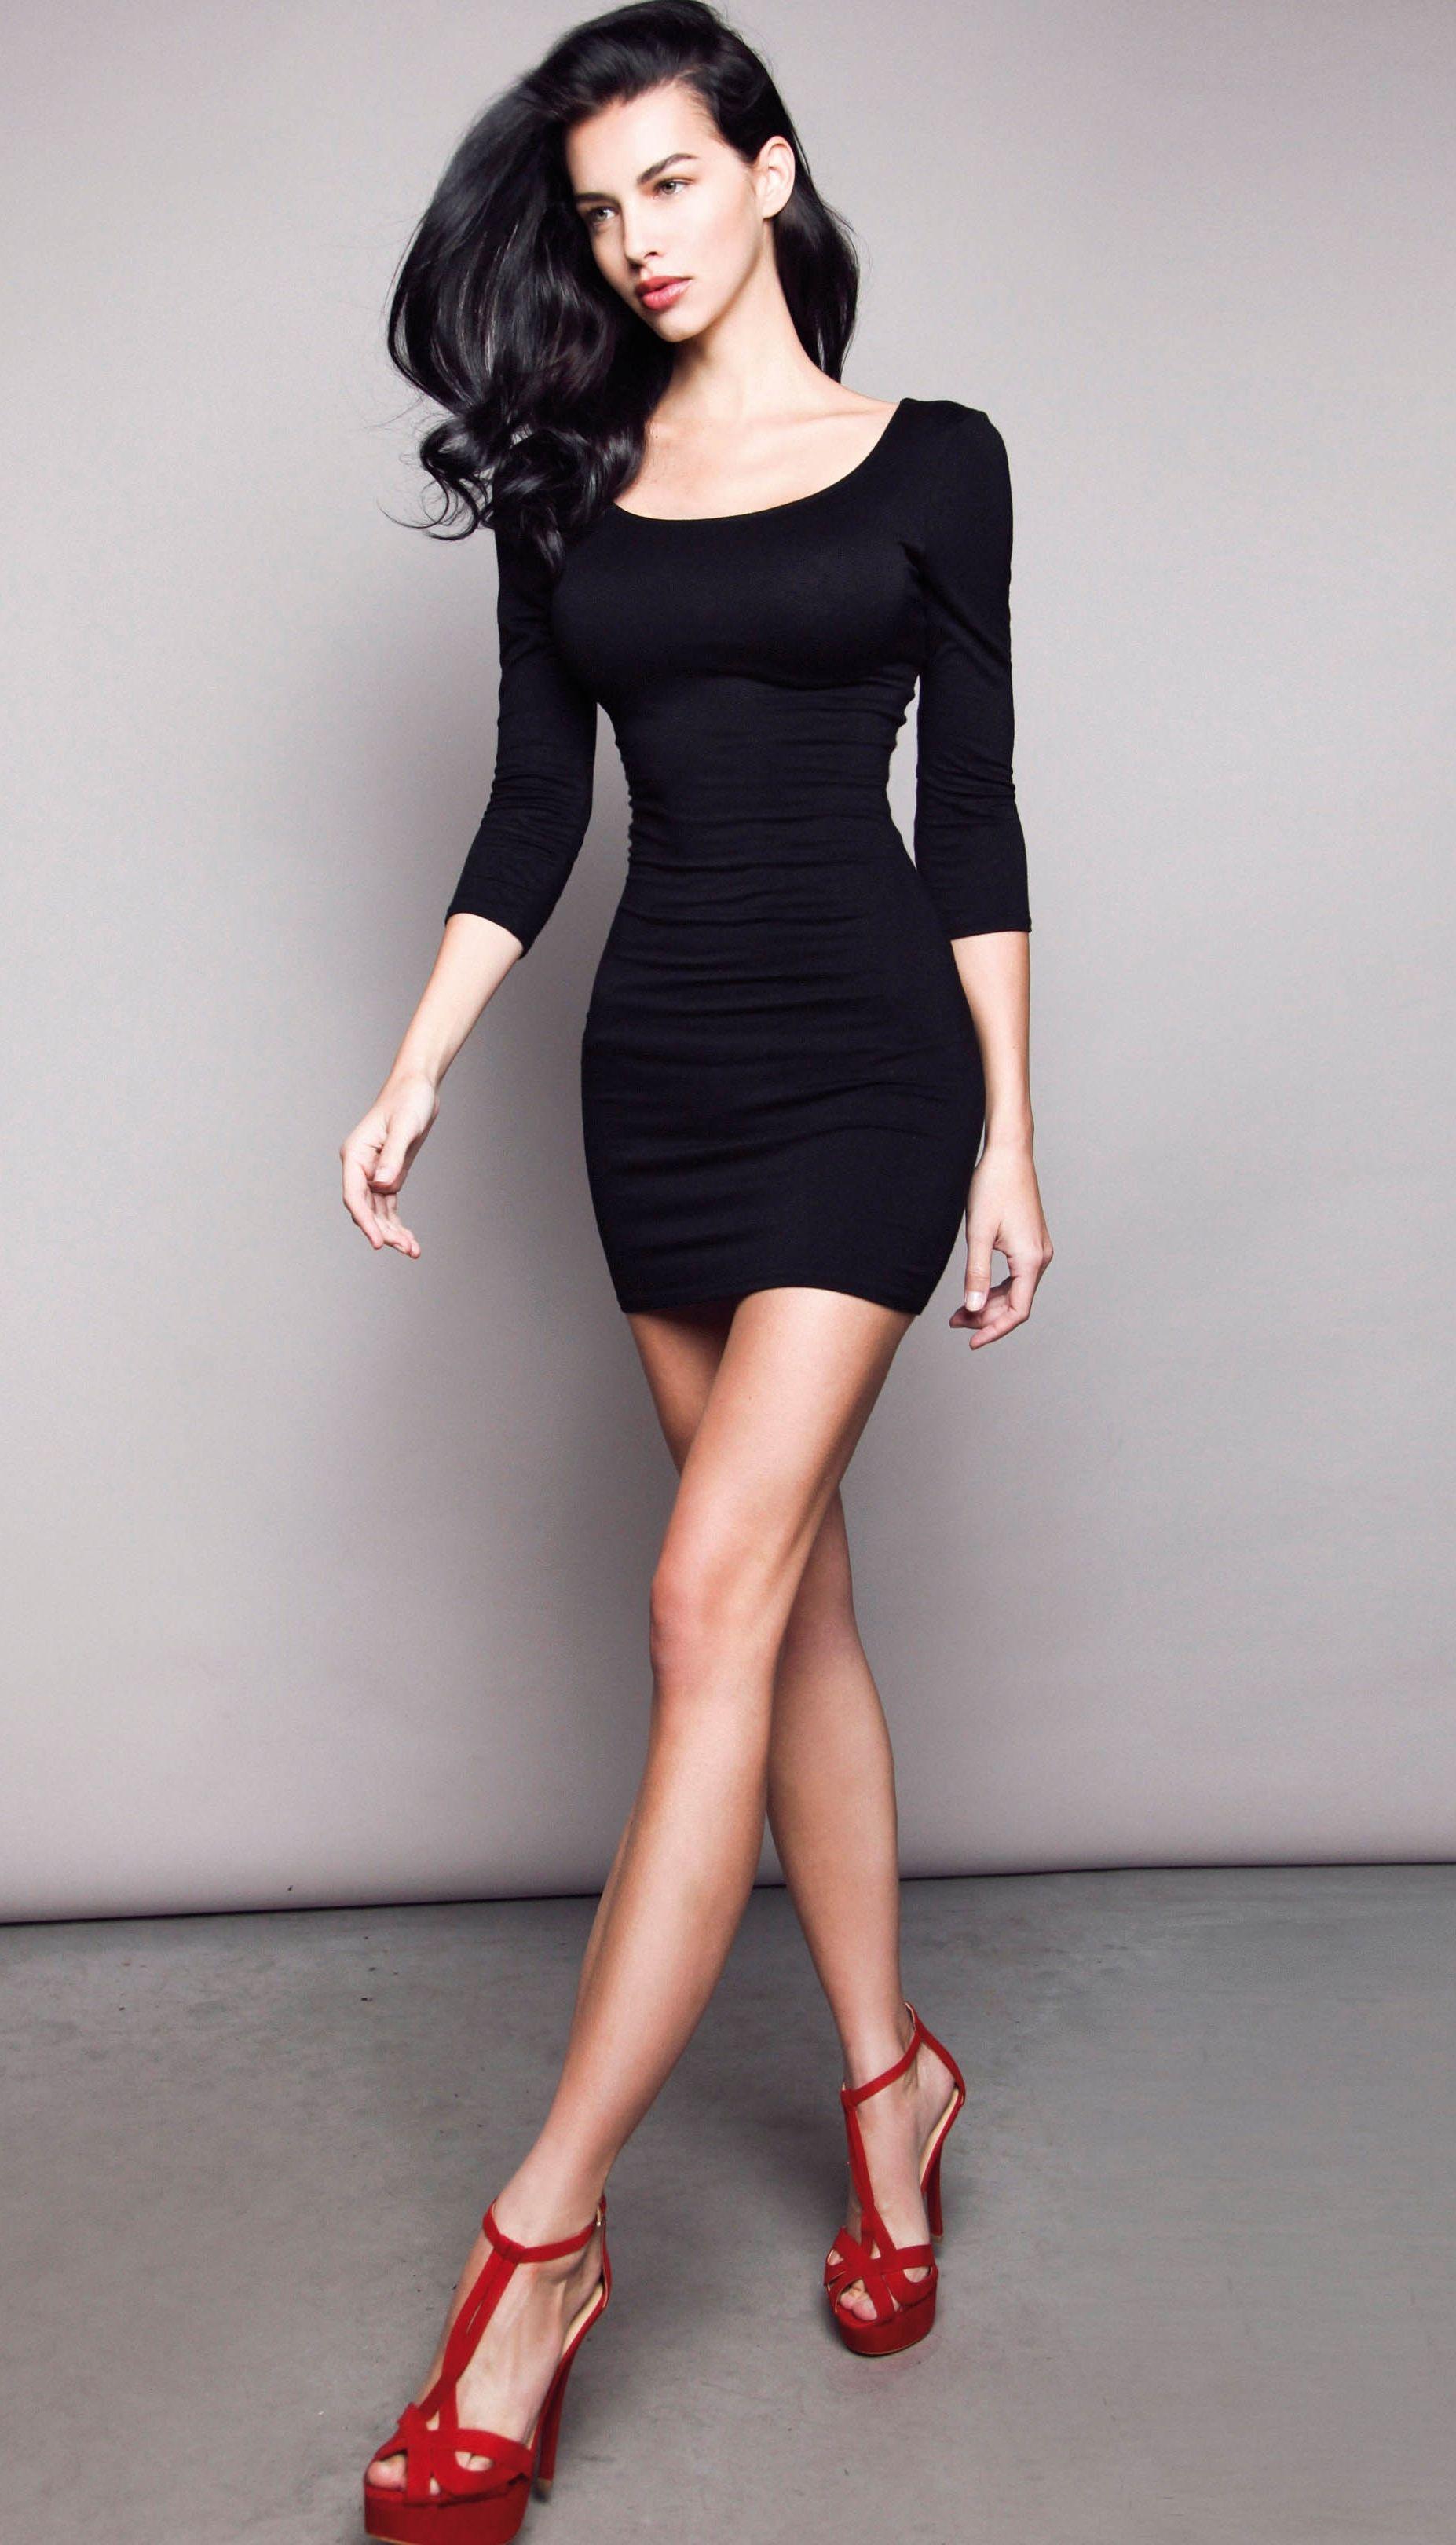 Pin On Sensual Women Tight Dresses 401 500 [ 3240 x 1854 Pixel ]